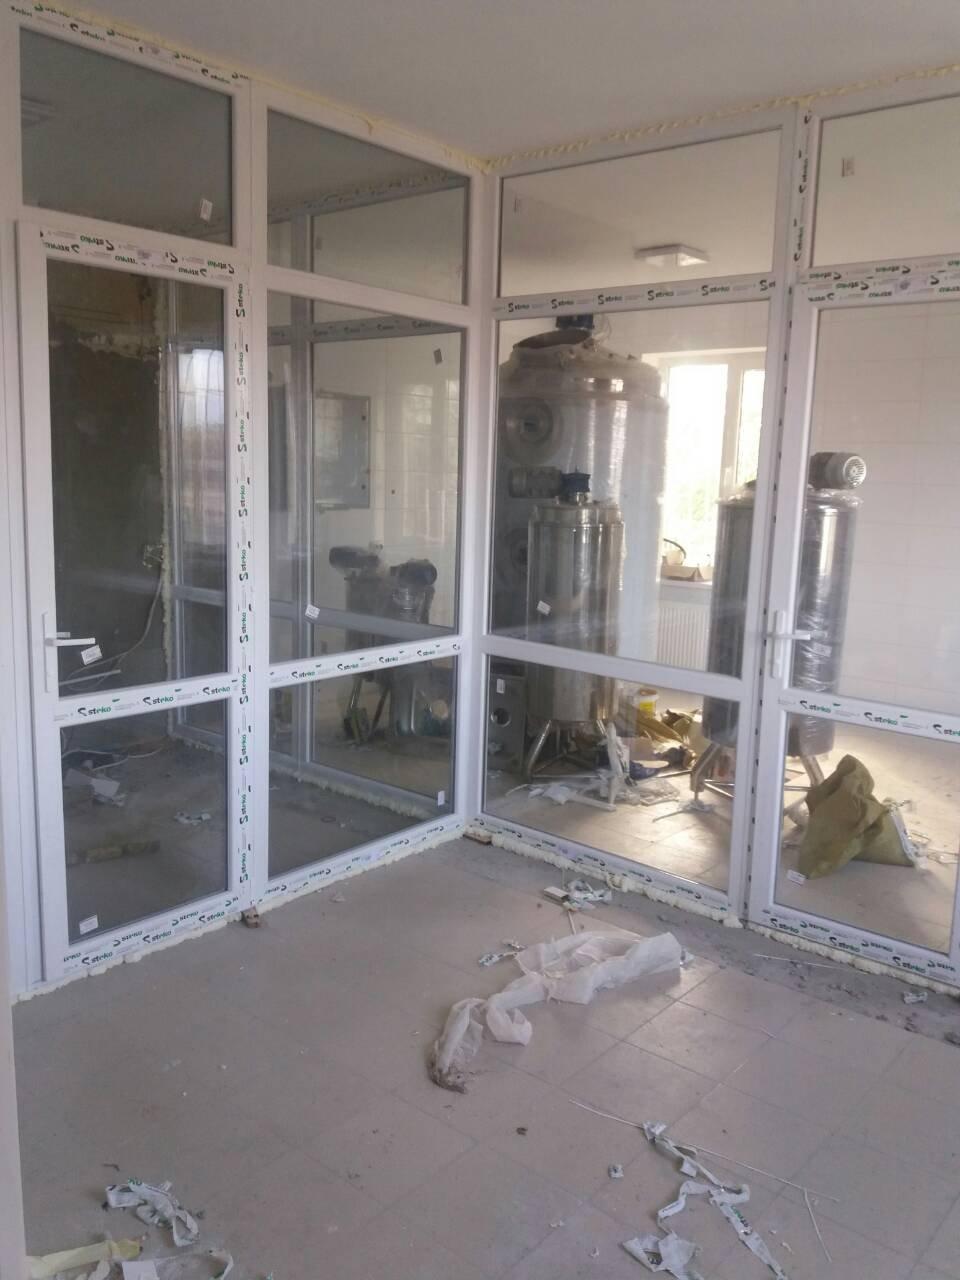 Fermentation facilities